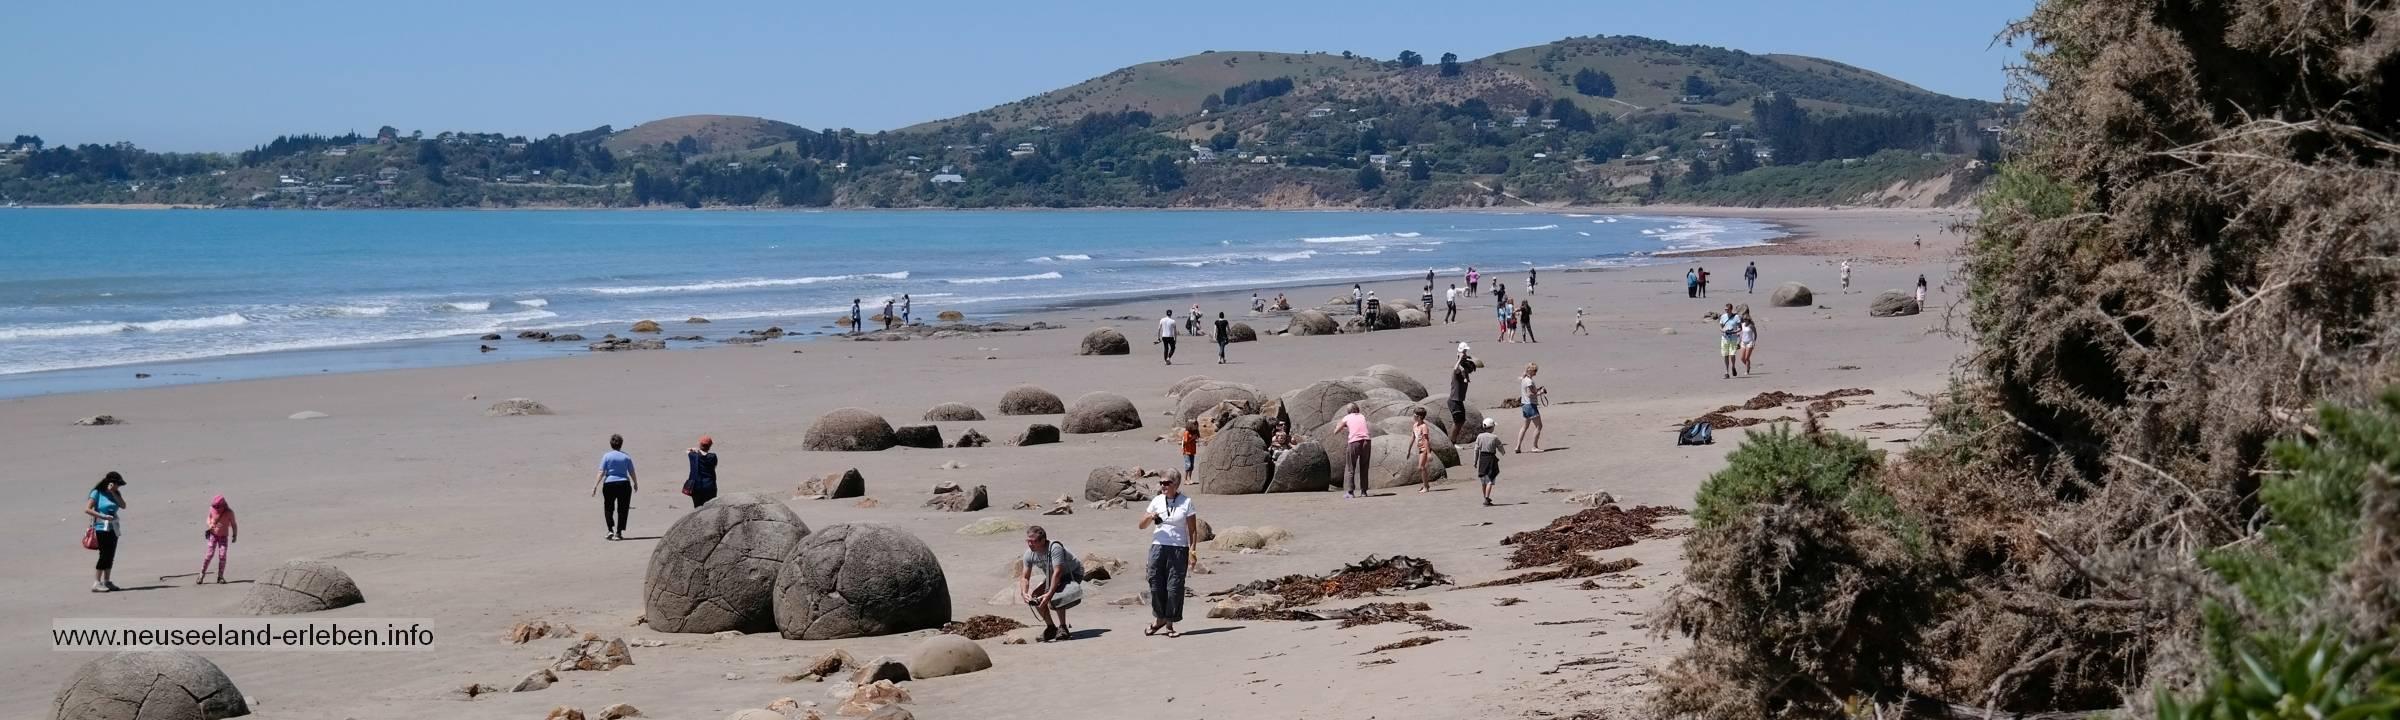 Die schönsten Rundungen Neuseelands – Moeraki Boulders